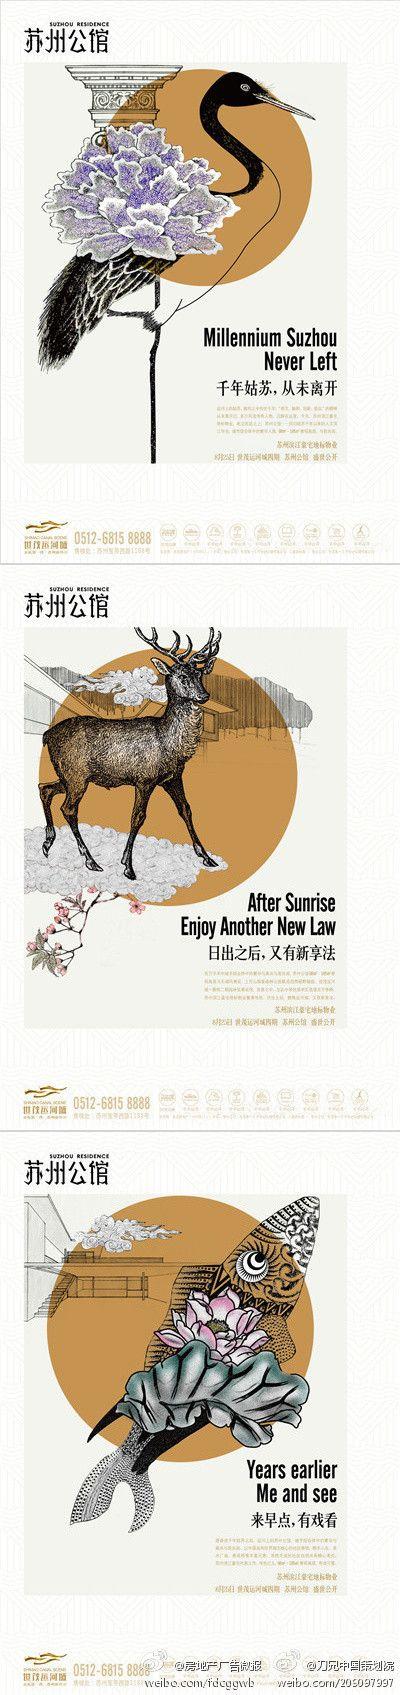 #地产广告#苏州公馆,千年苏州,从未离开... #Graphic Design Poster